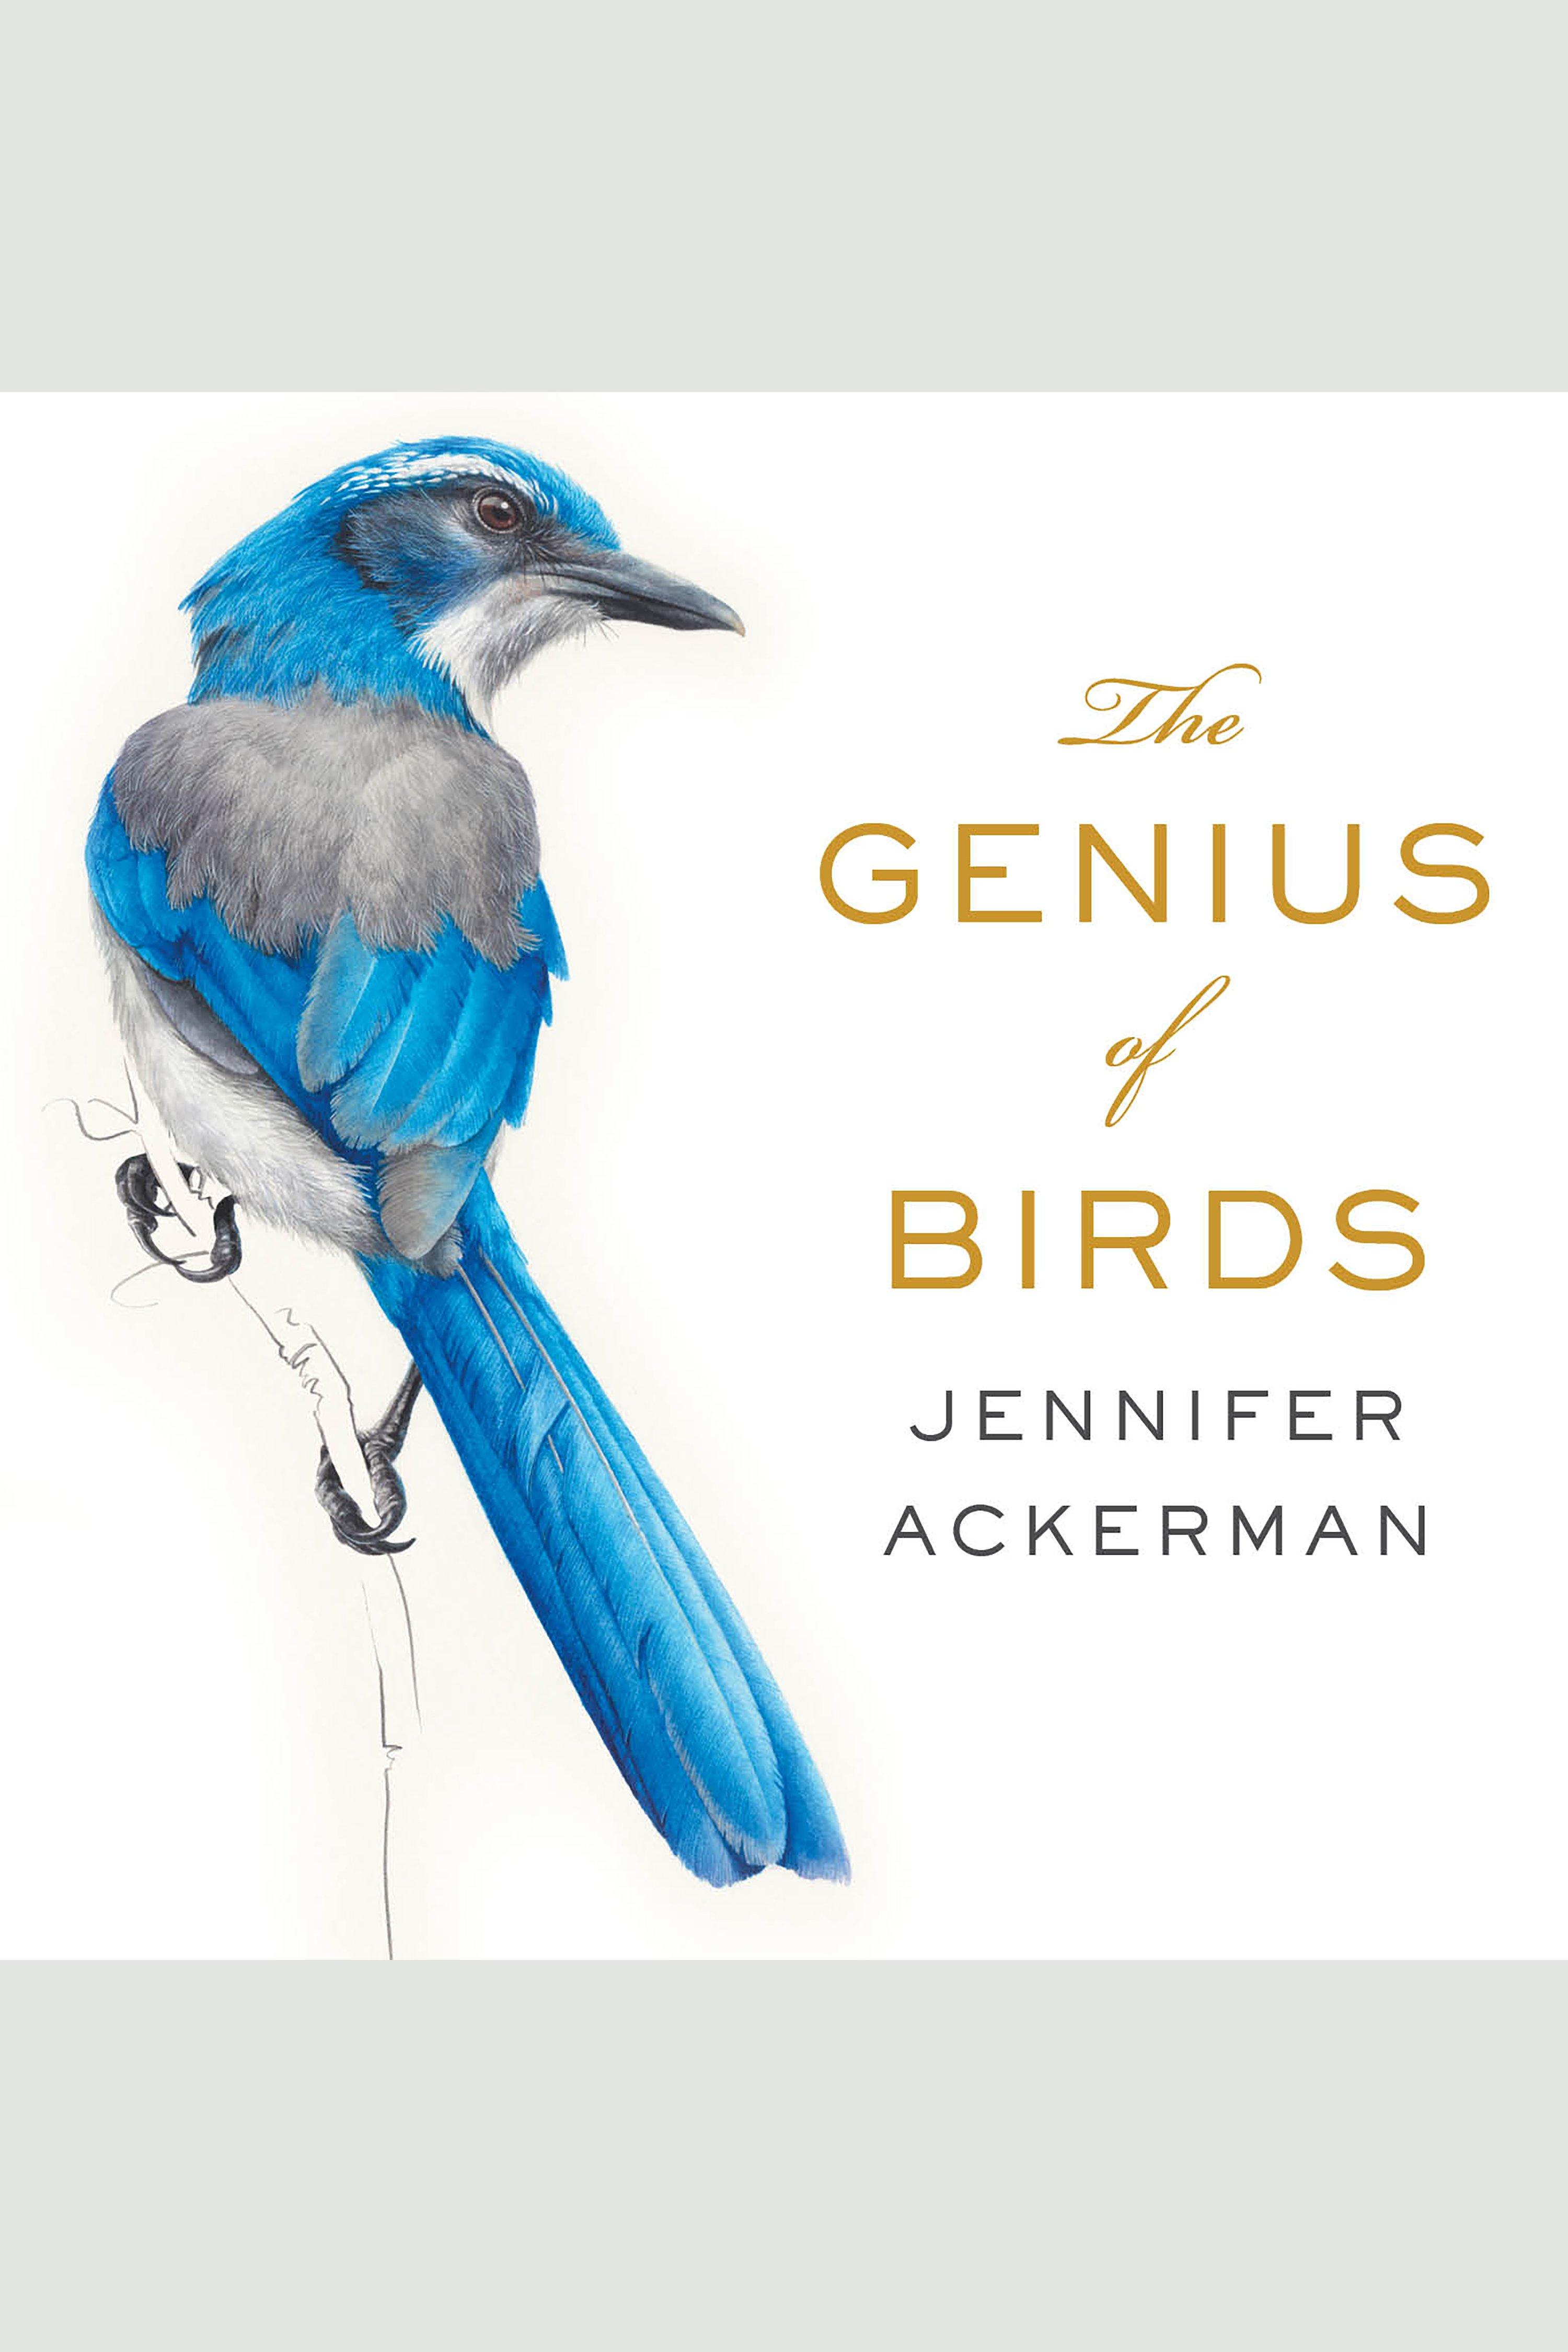 Genius of Birds, The